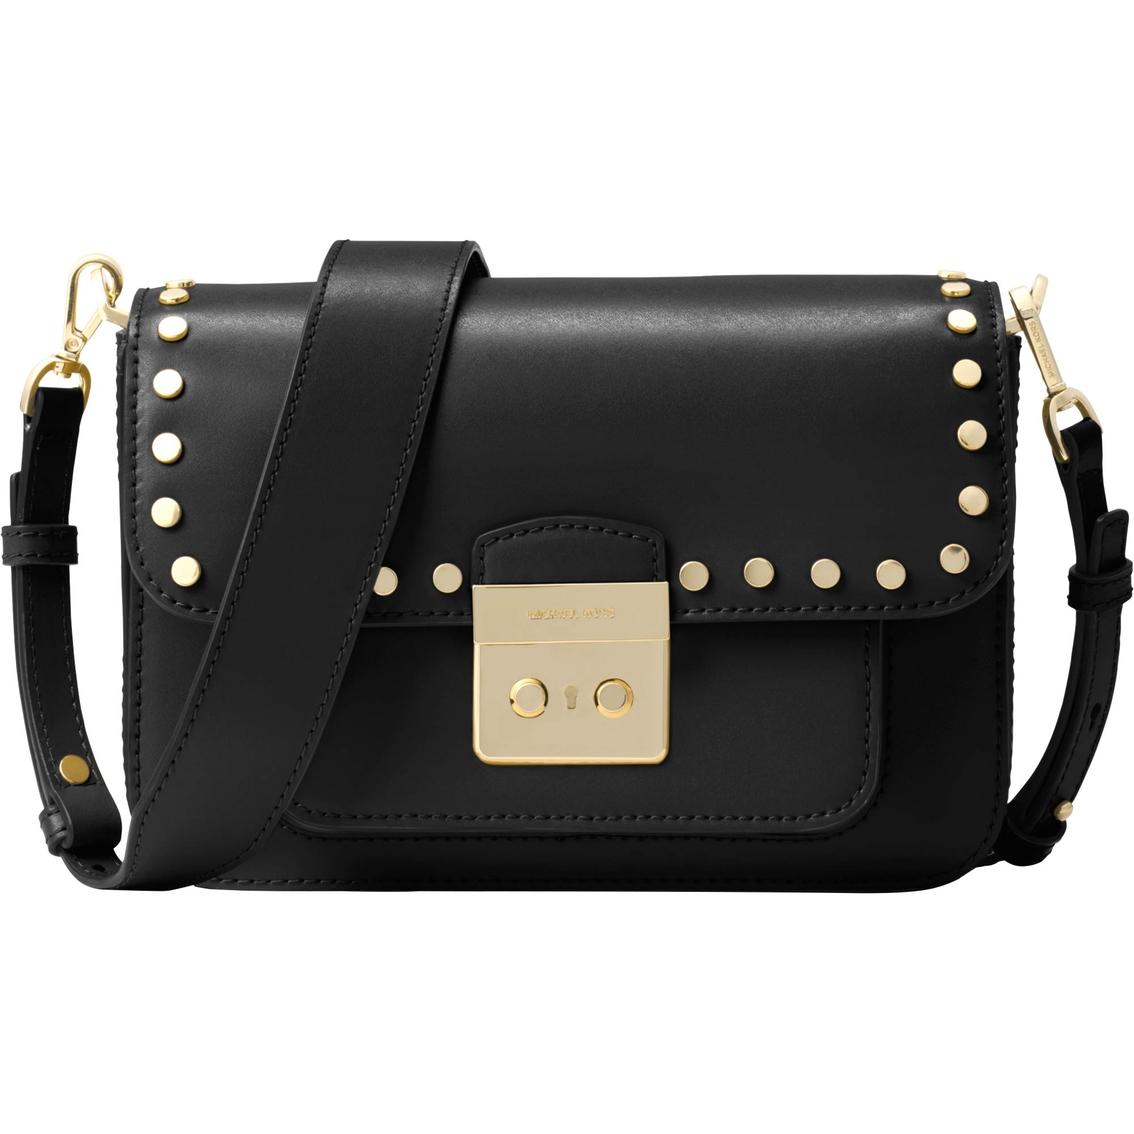 63d80645e0f9 Michael Kors Sloan Editor Large Shoulder Bag | Handbags | Shop The ...